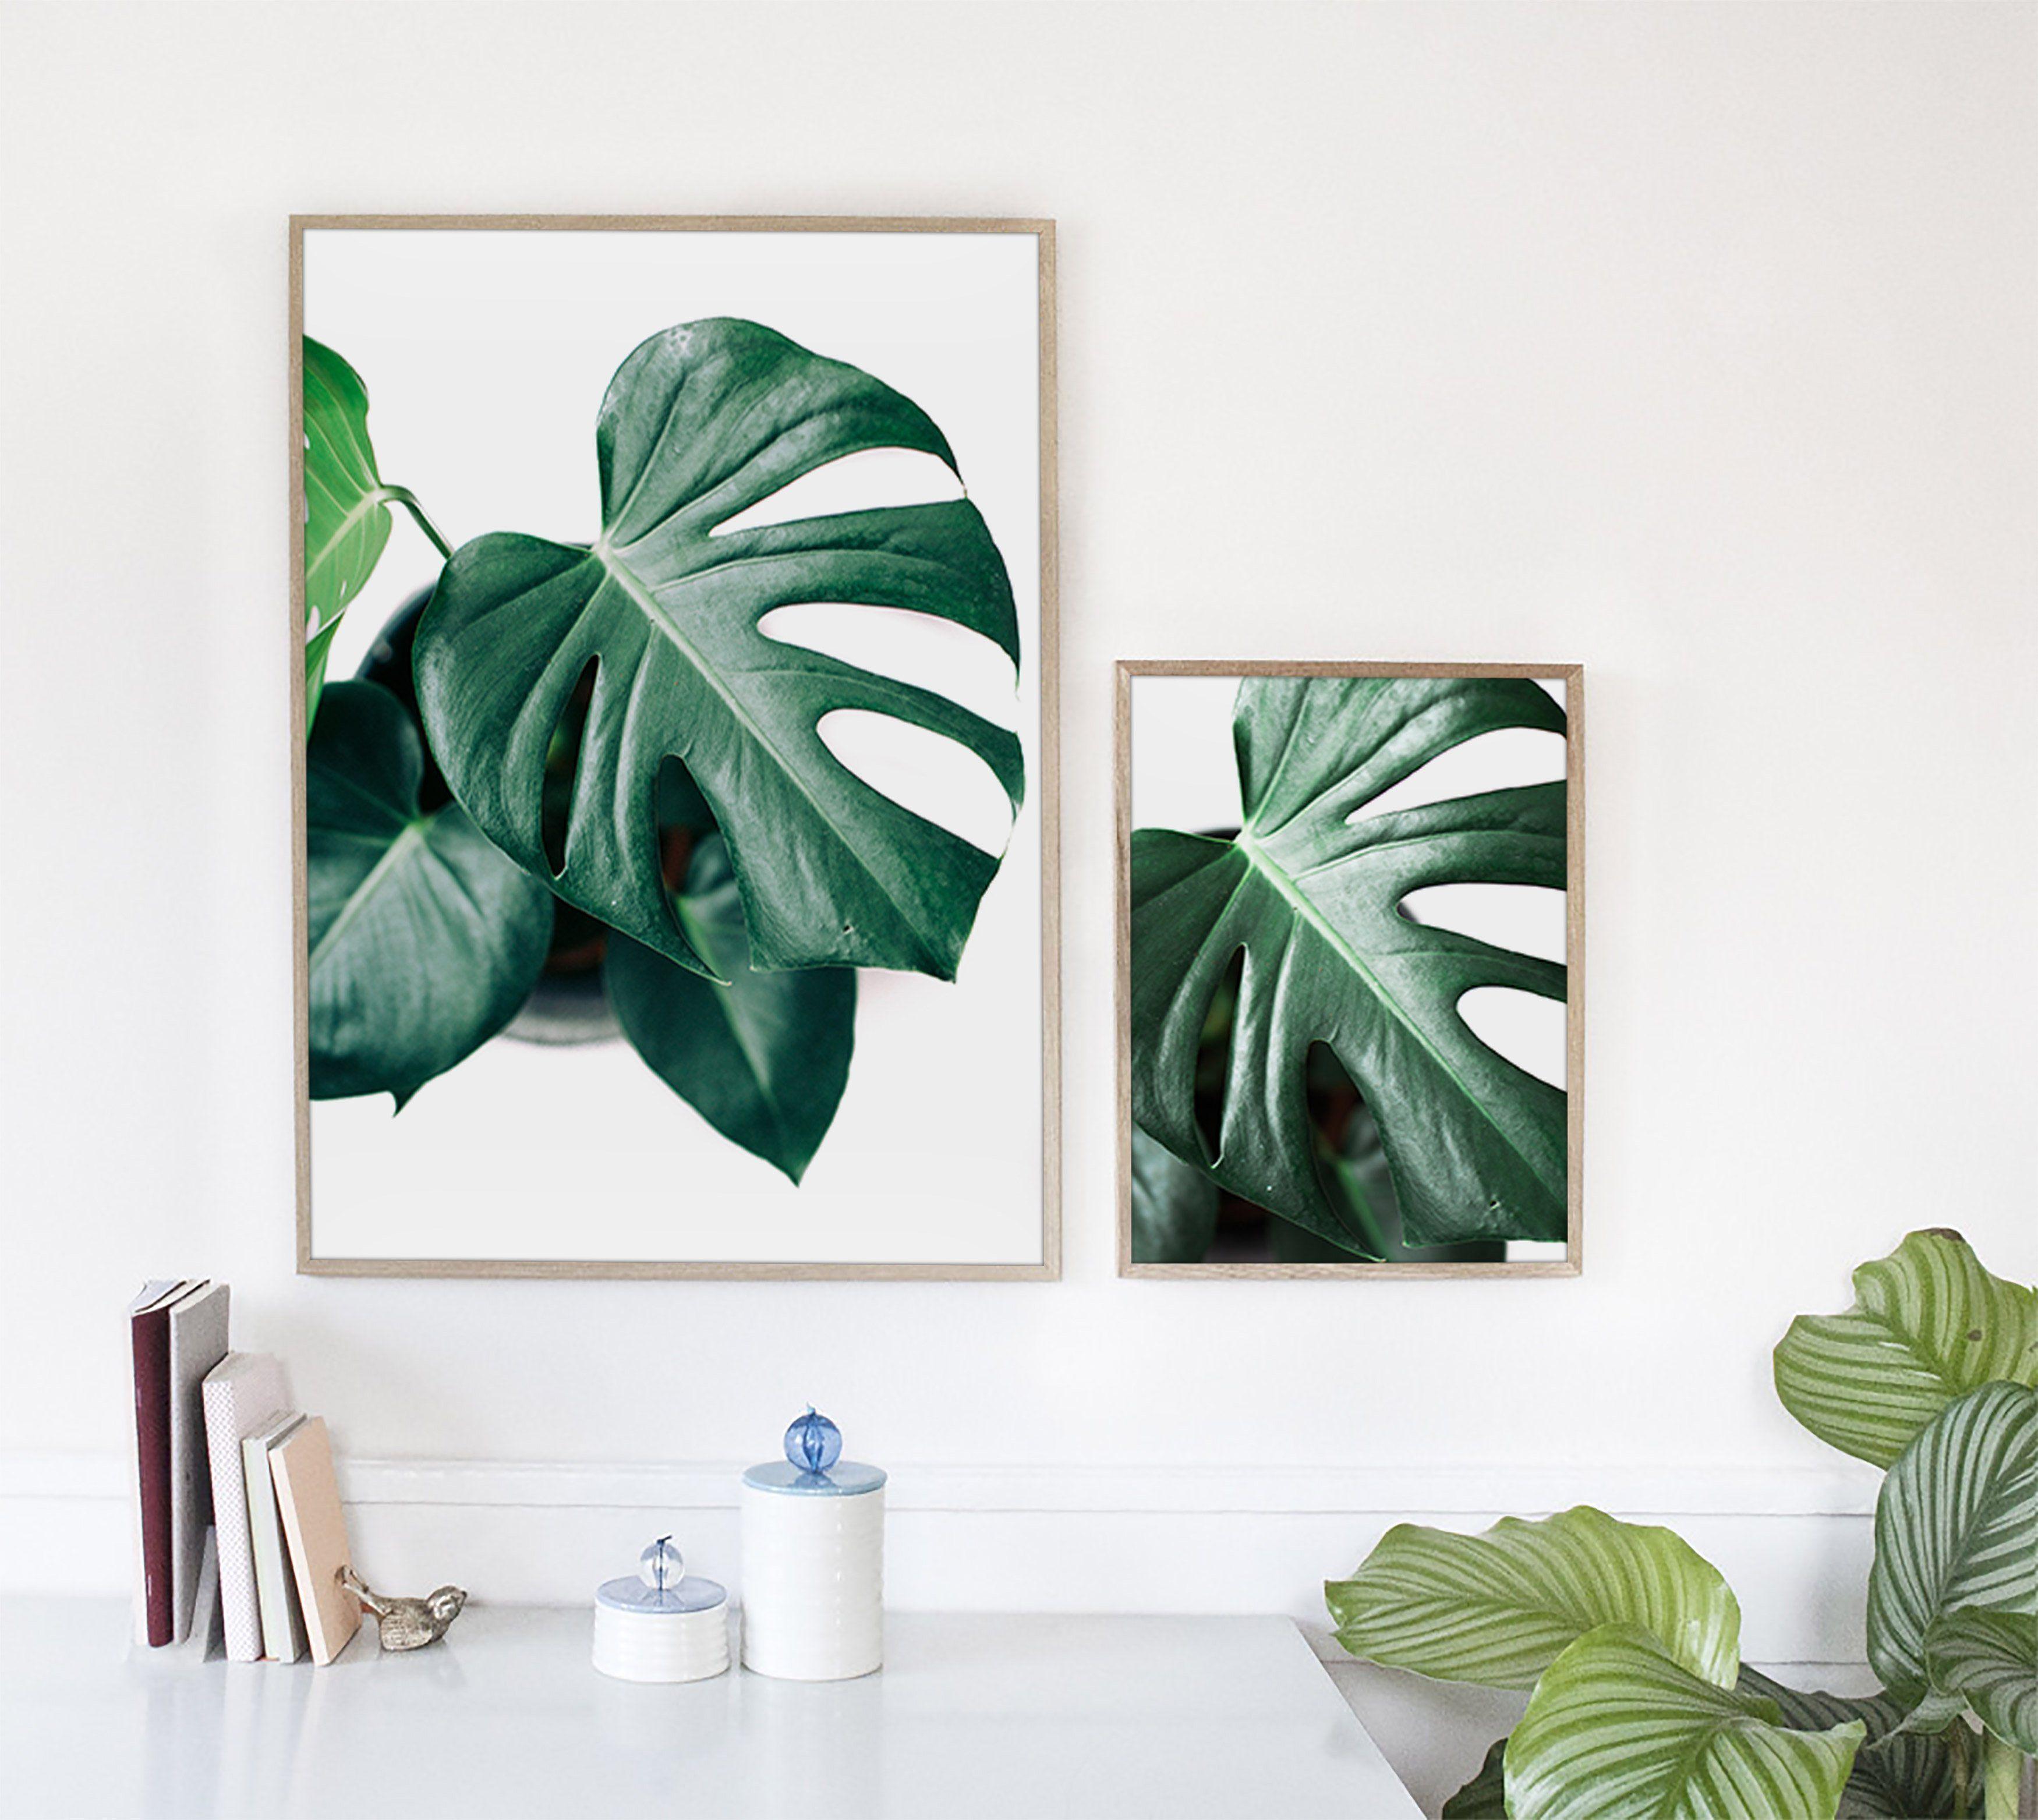 European Inspired Home Decor: 4 Green Monstera Stock Photos By Nellaino On